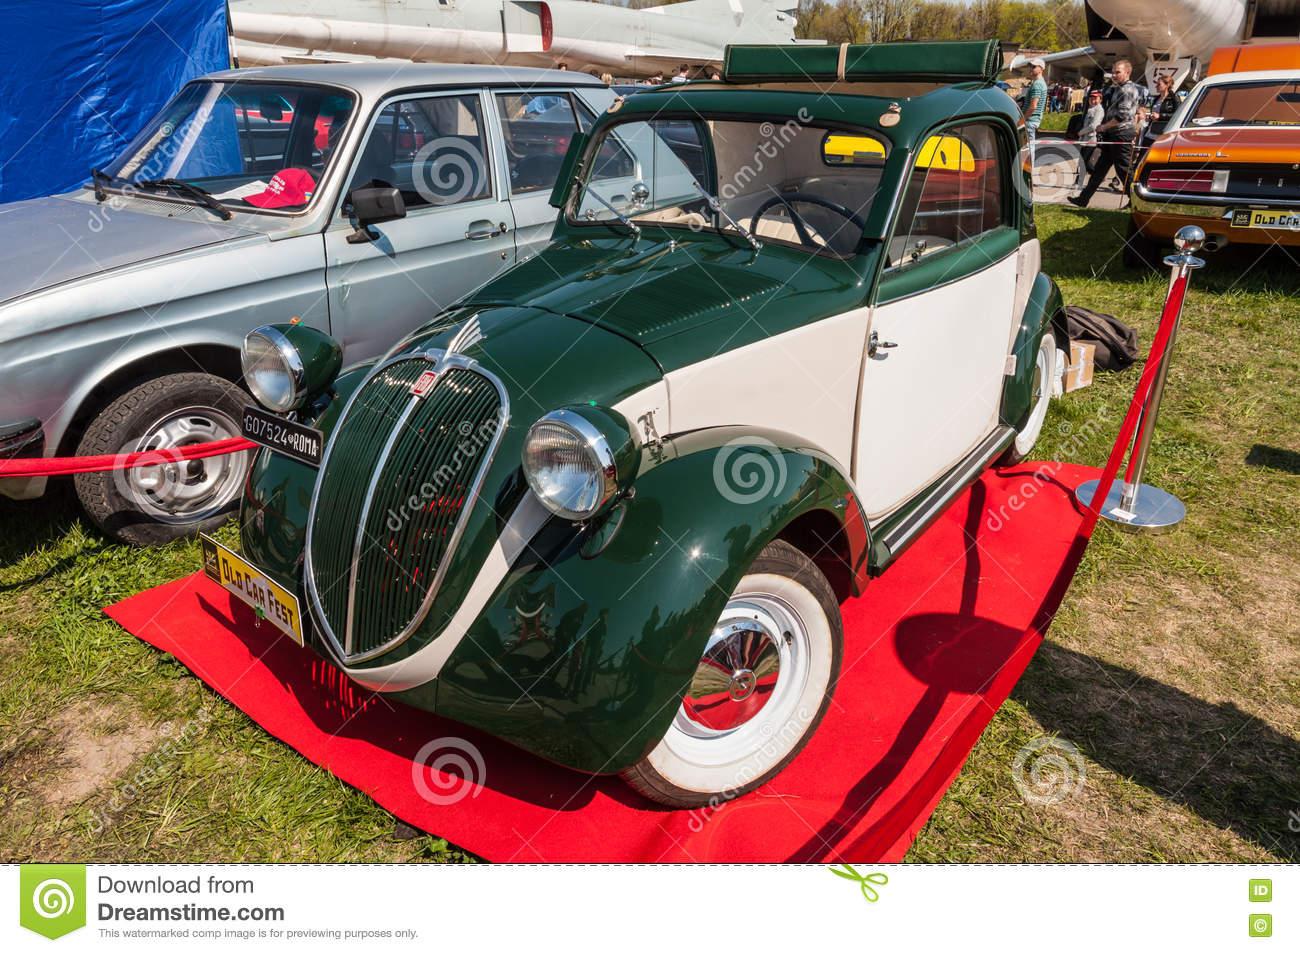 Italian Fiat 500 Topolino Vintage Car Editorial Stock Photo.